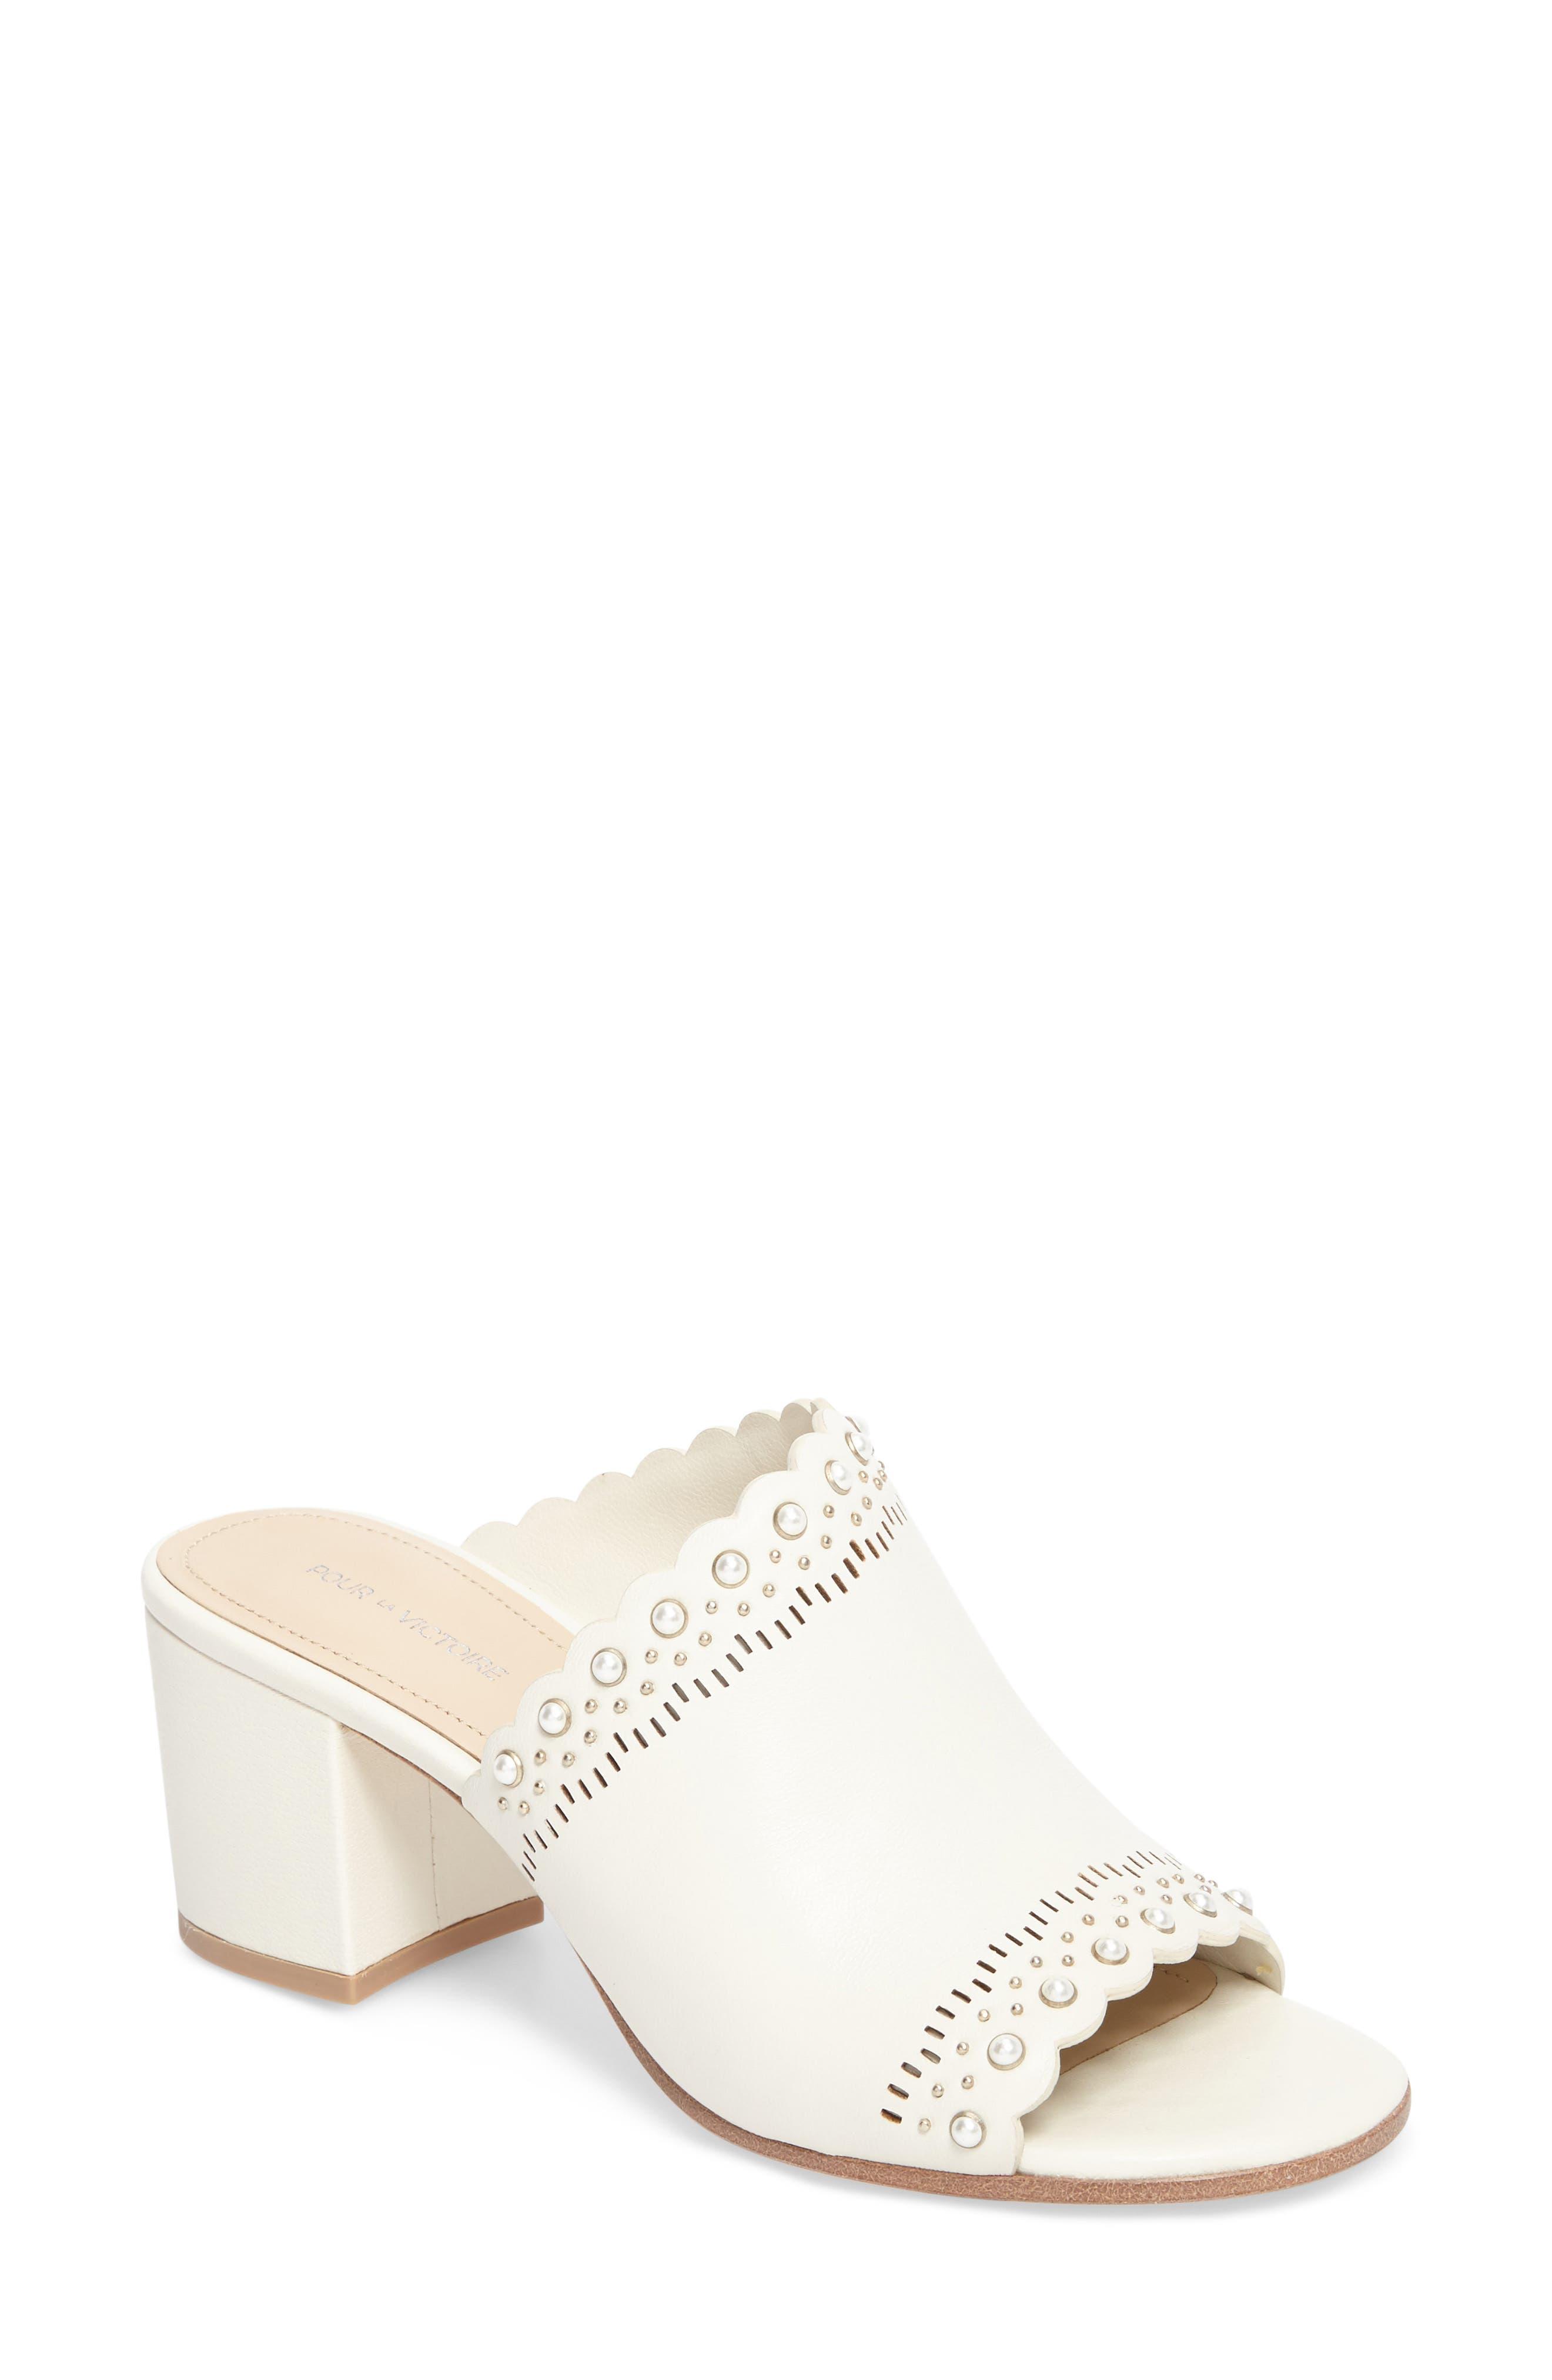 Main Image - Pour la Victoire Amela Embellished Slide Sandal (Women)